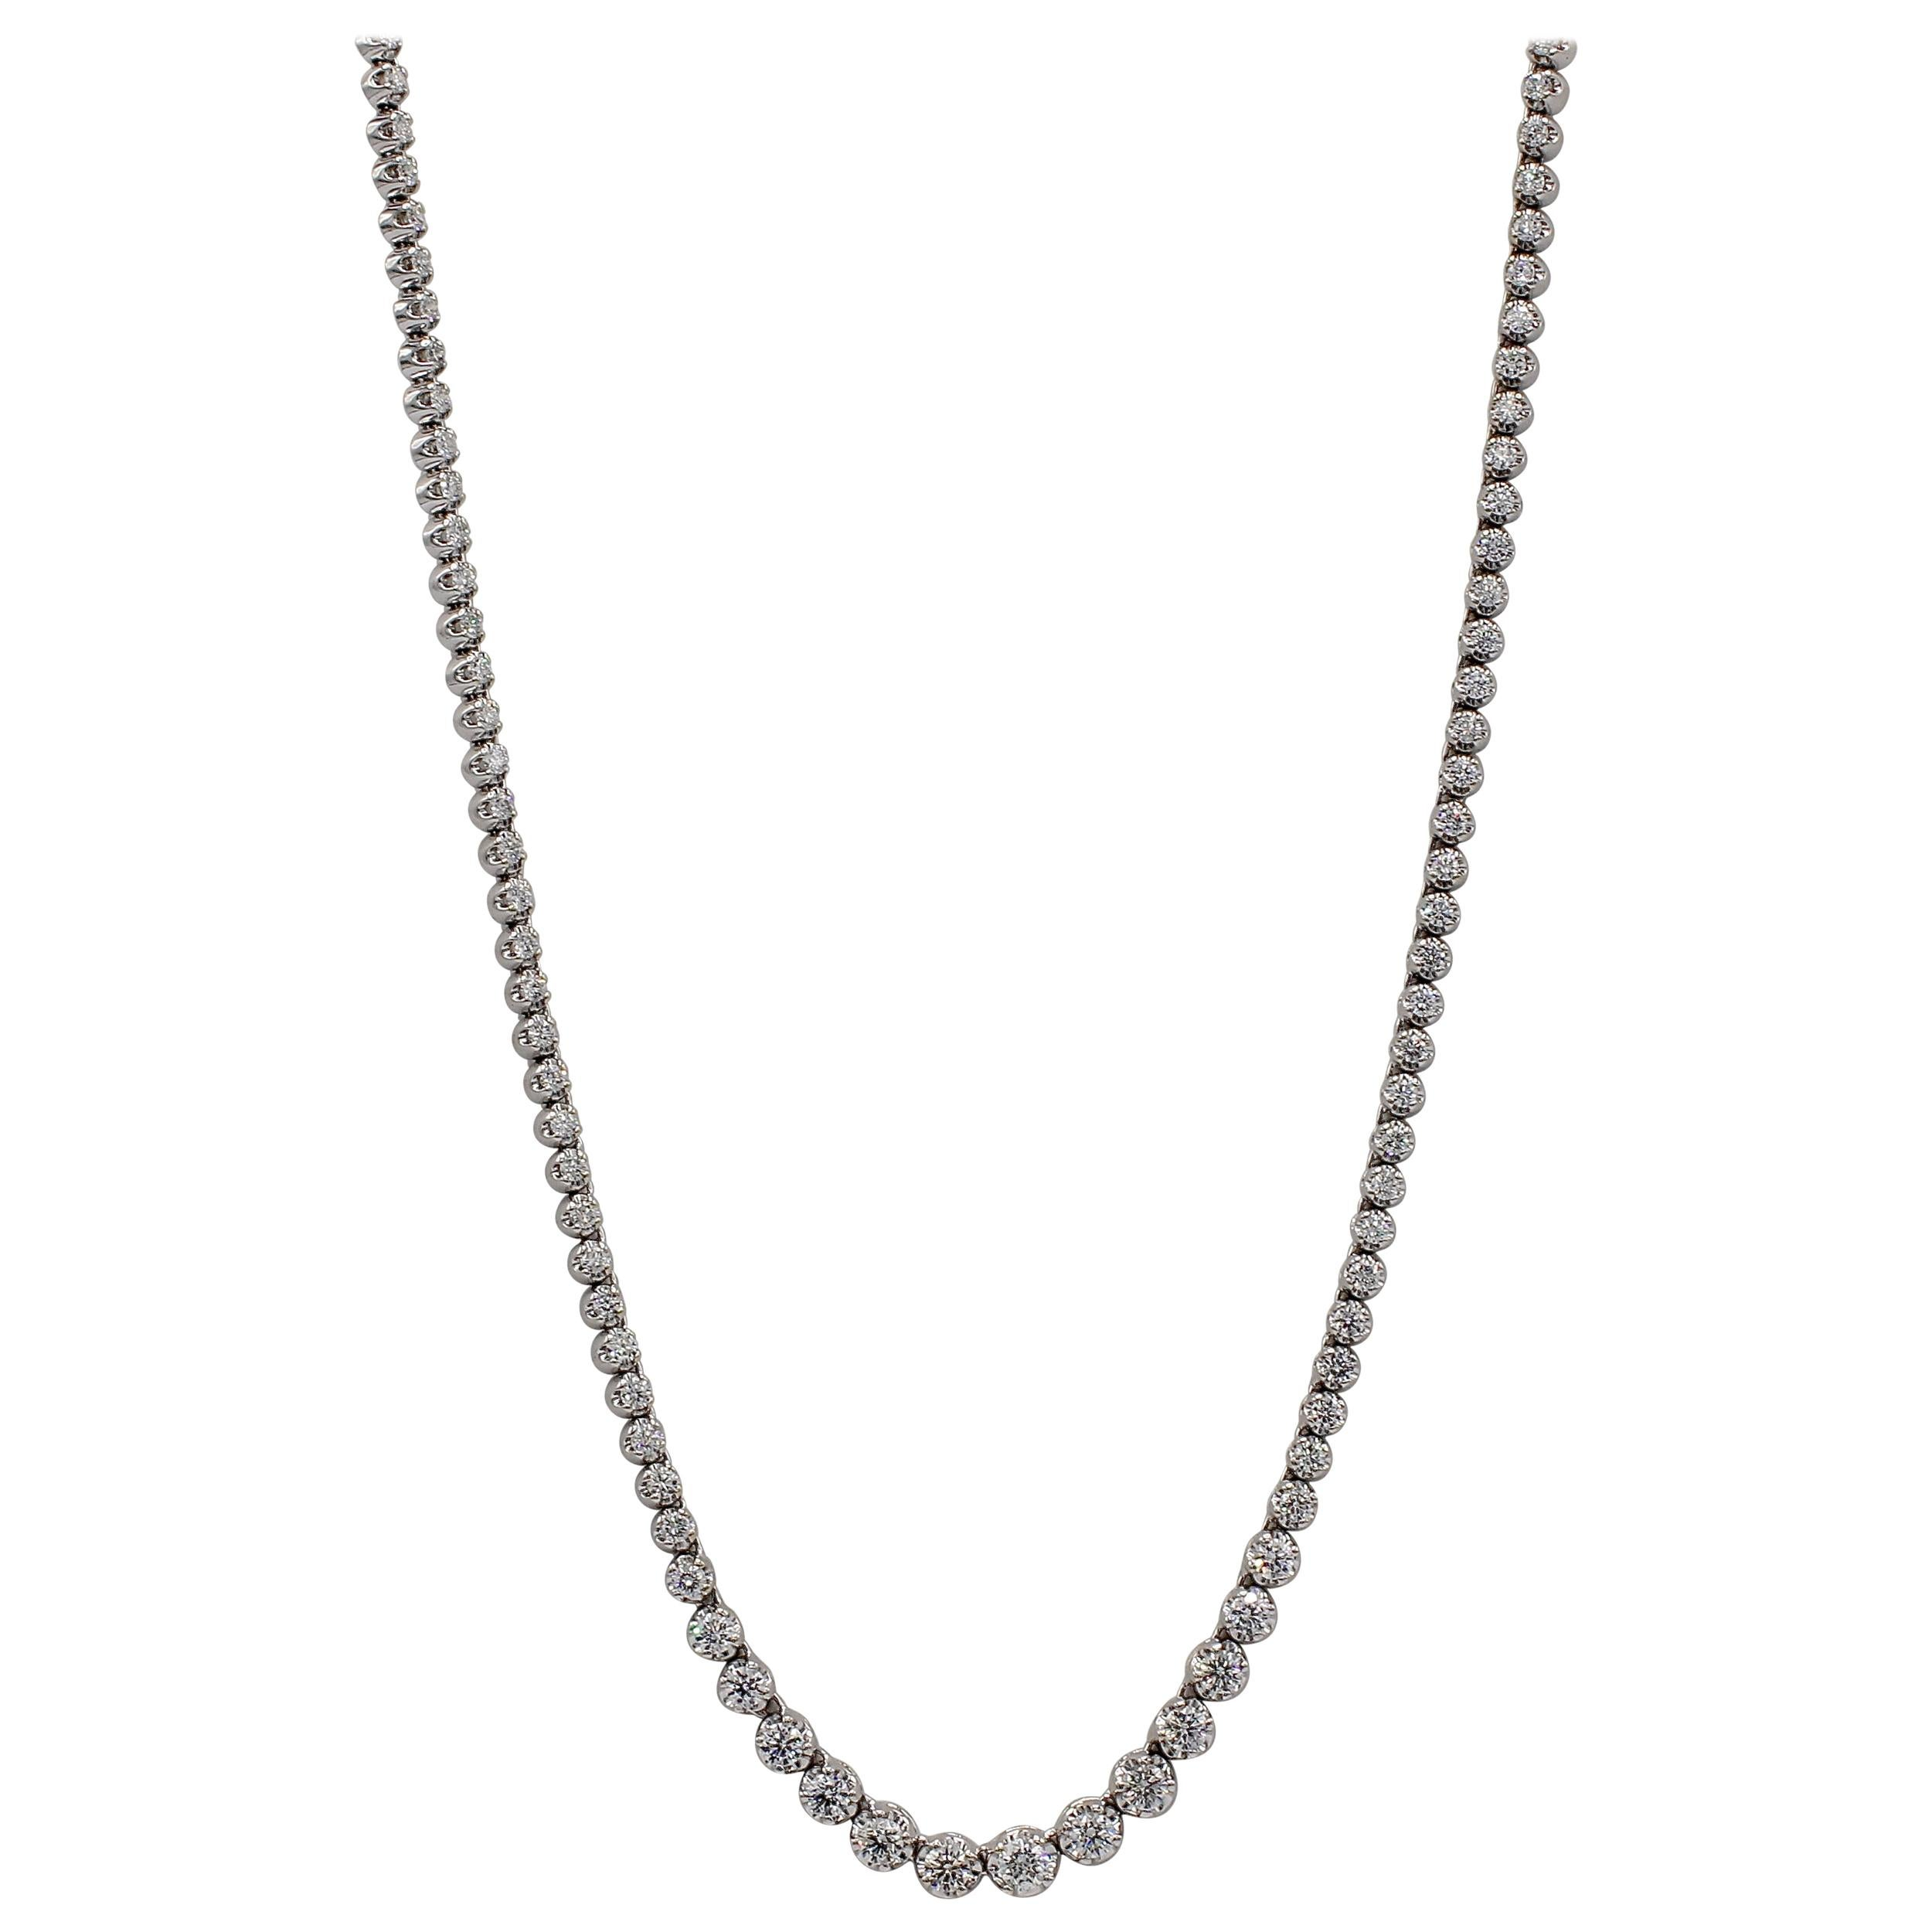 14 Karat White Gold 7 Carat Diamond Riviera Graduated Necklace